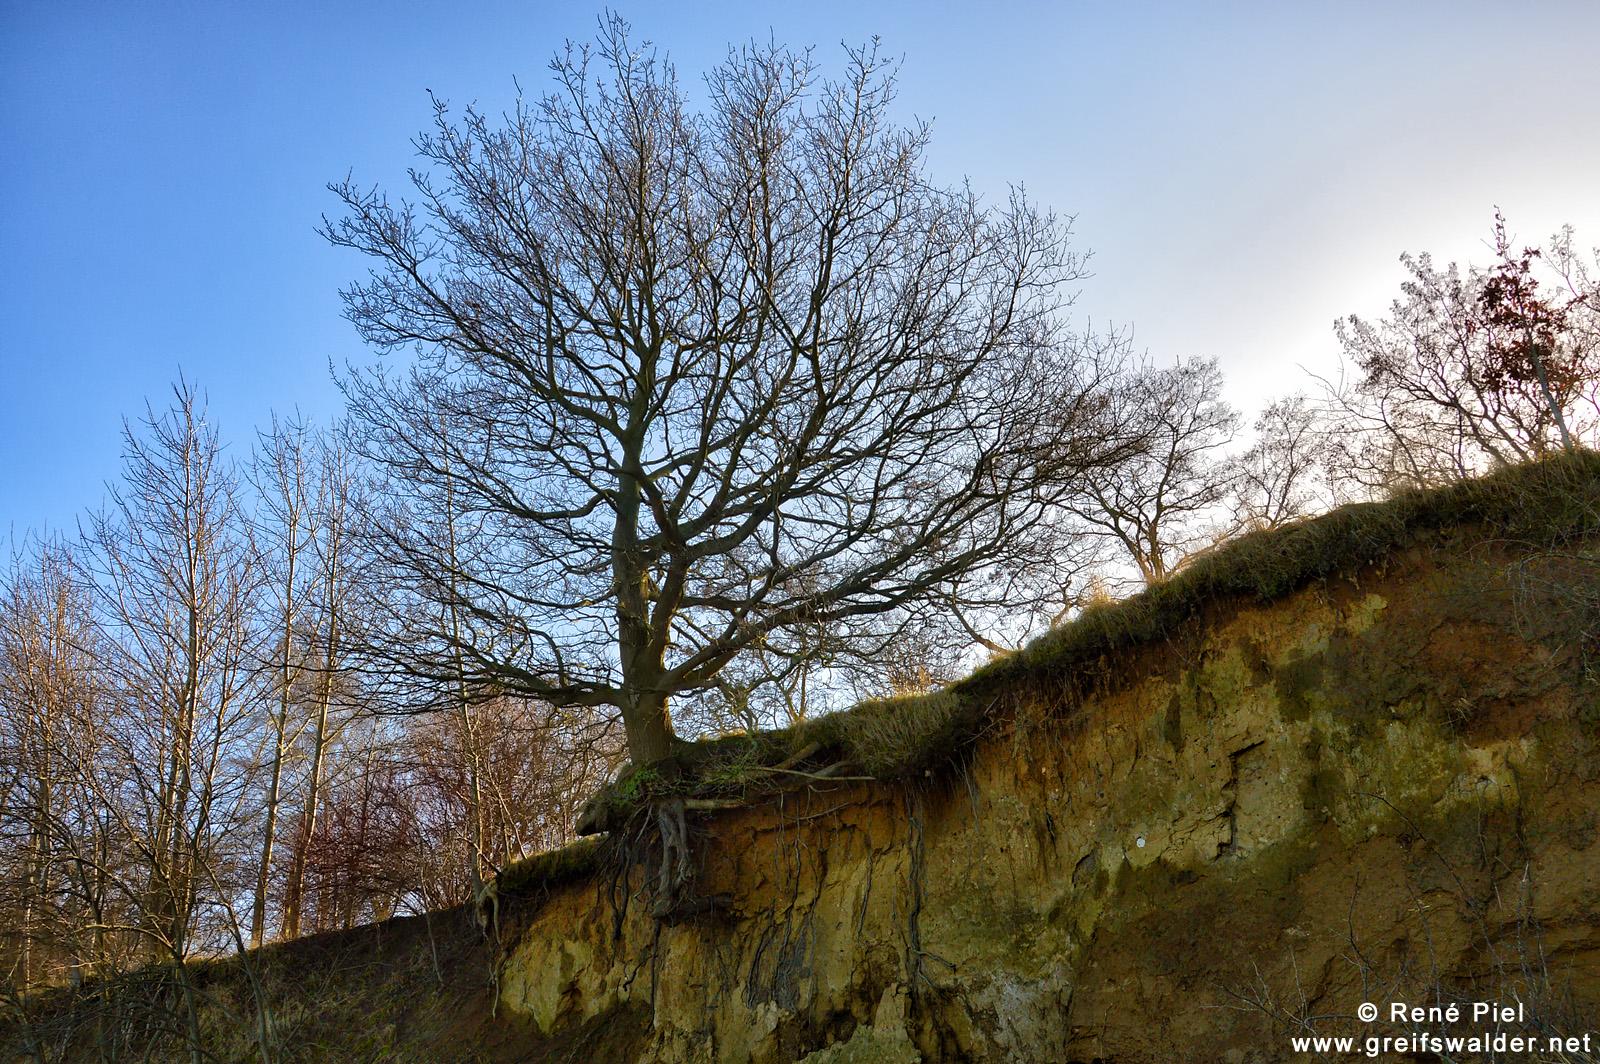 Baum an der Kante